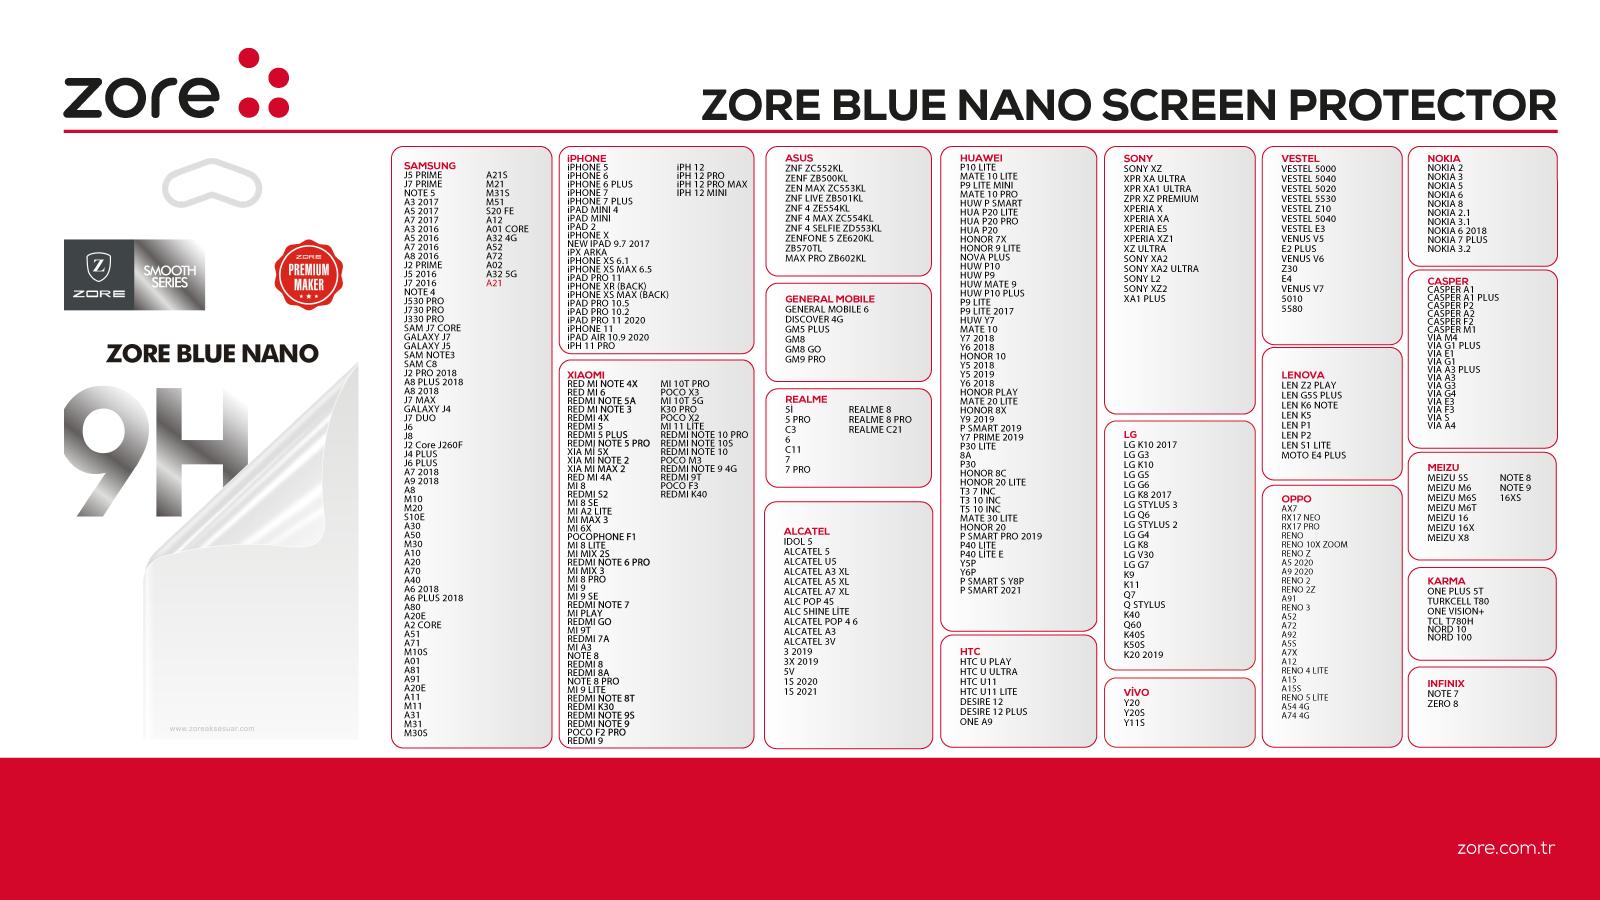 ZORE BLUE NANO SCREEN POTECTOR.jpg (555 KB)